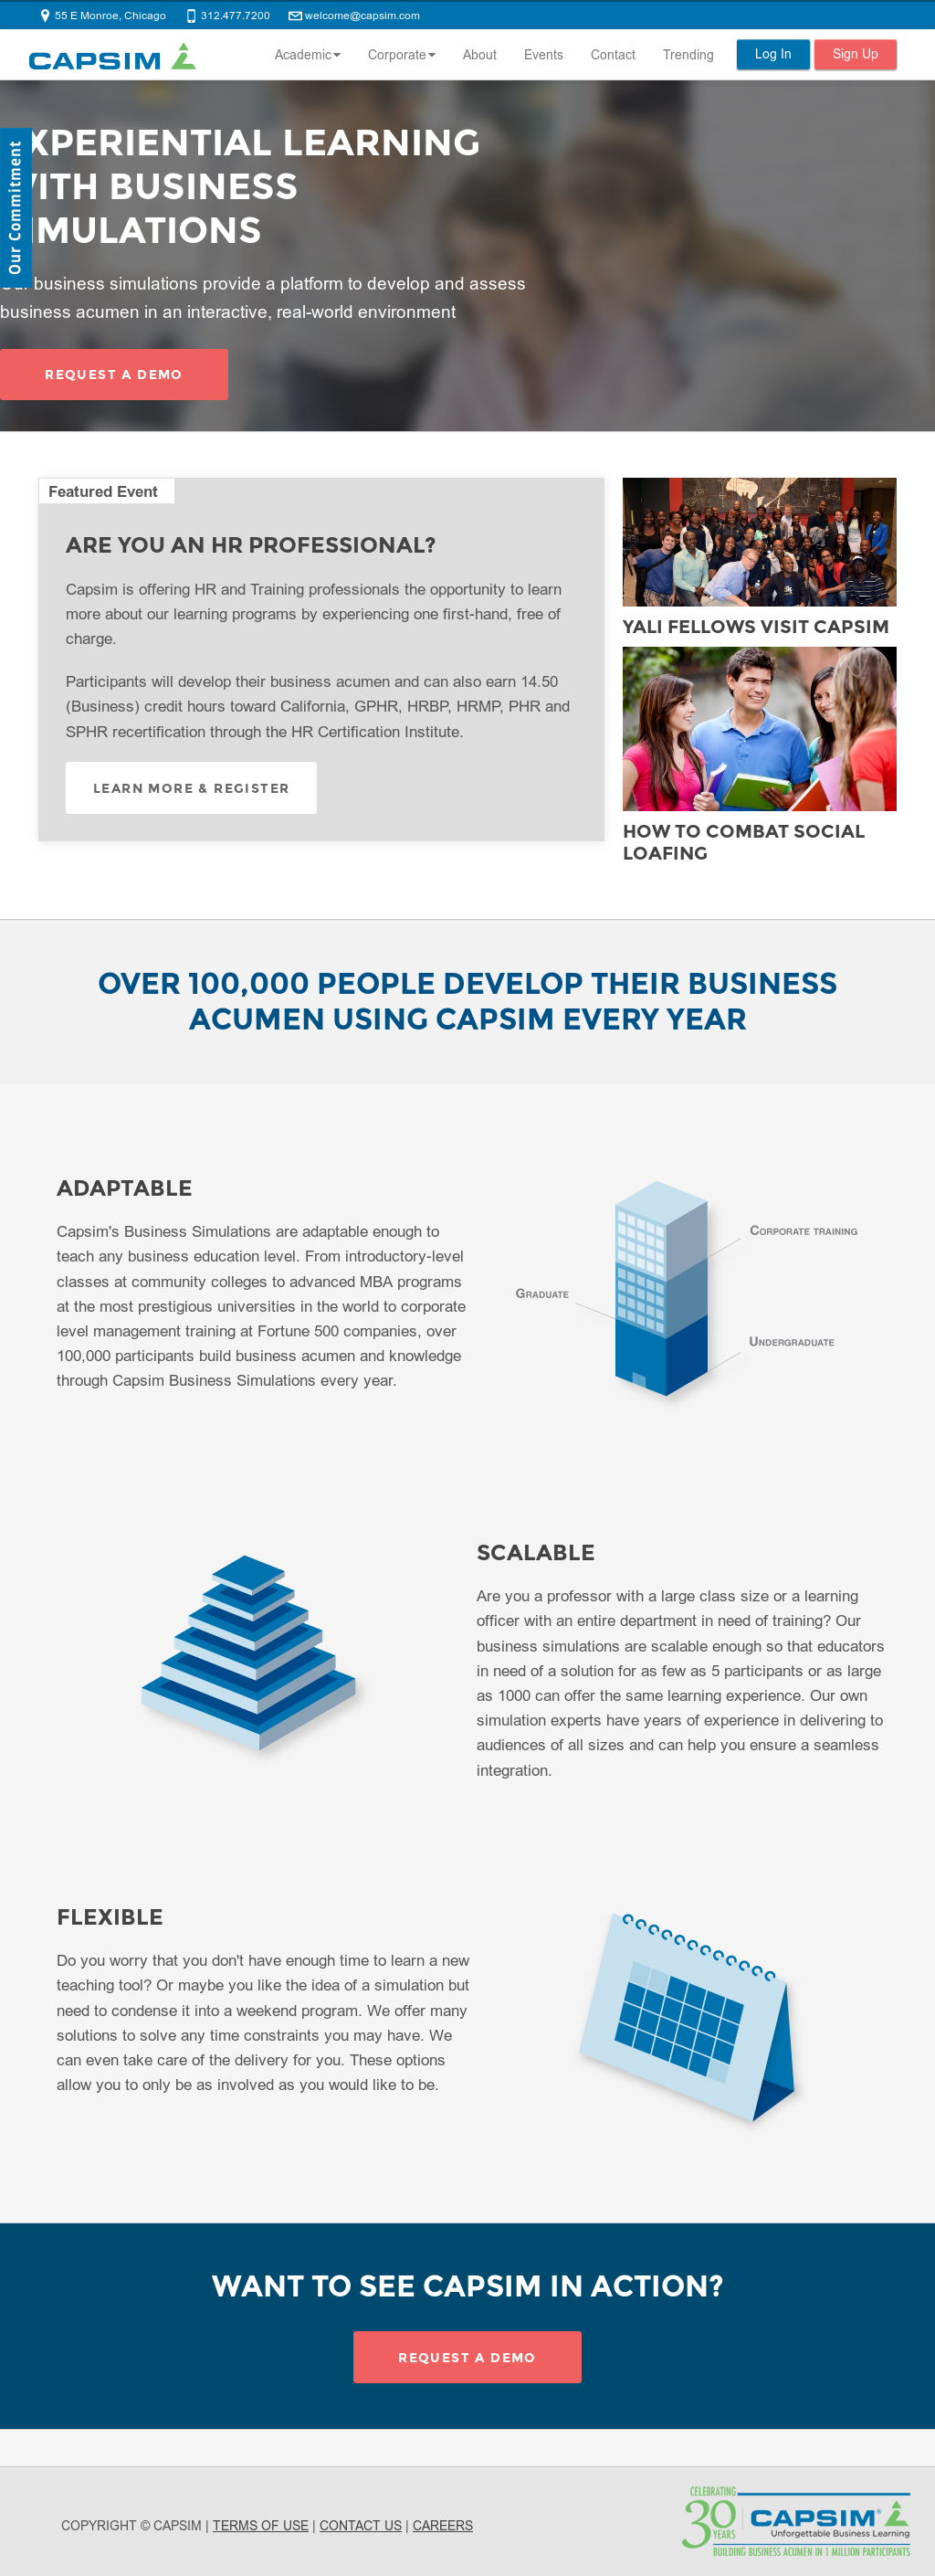 Capsim Competitors, Revenue and Employees - Owler Company Profile